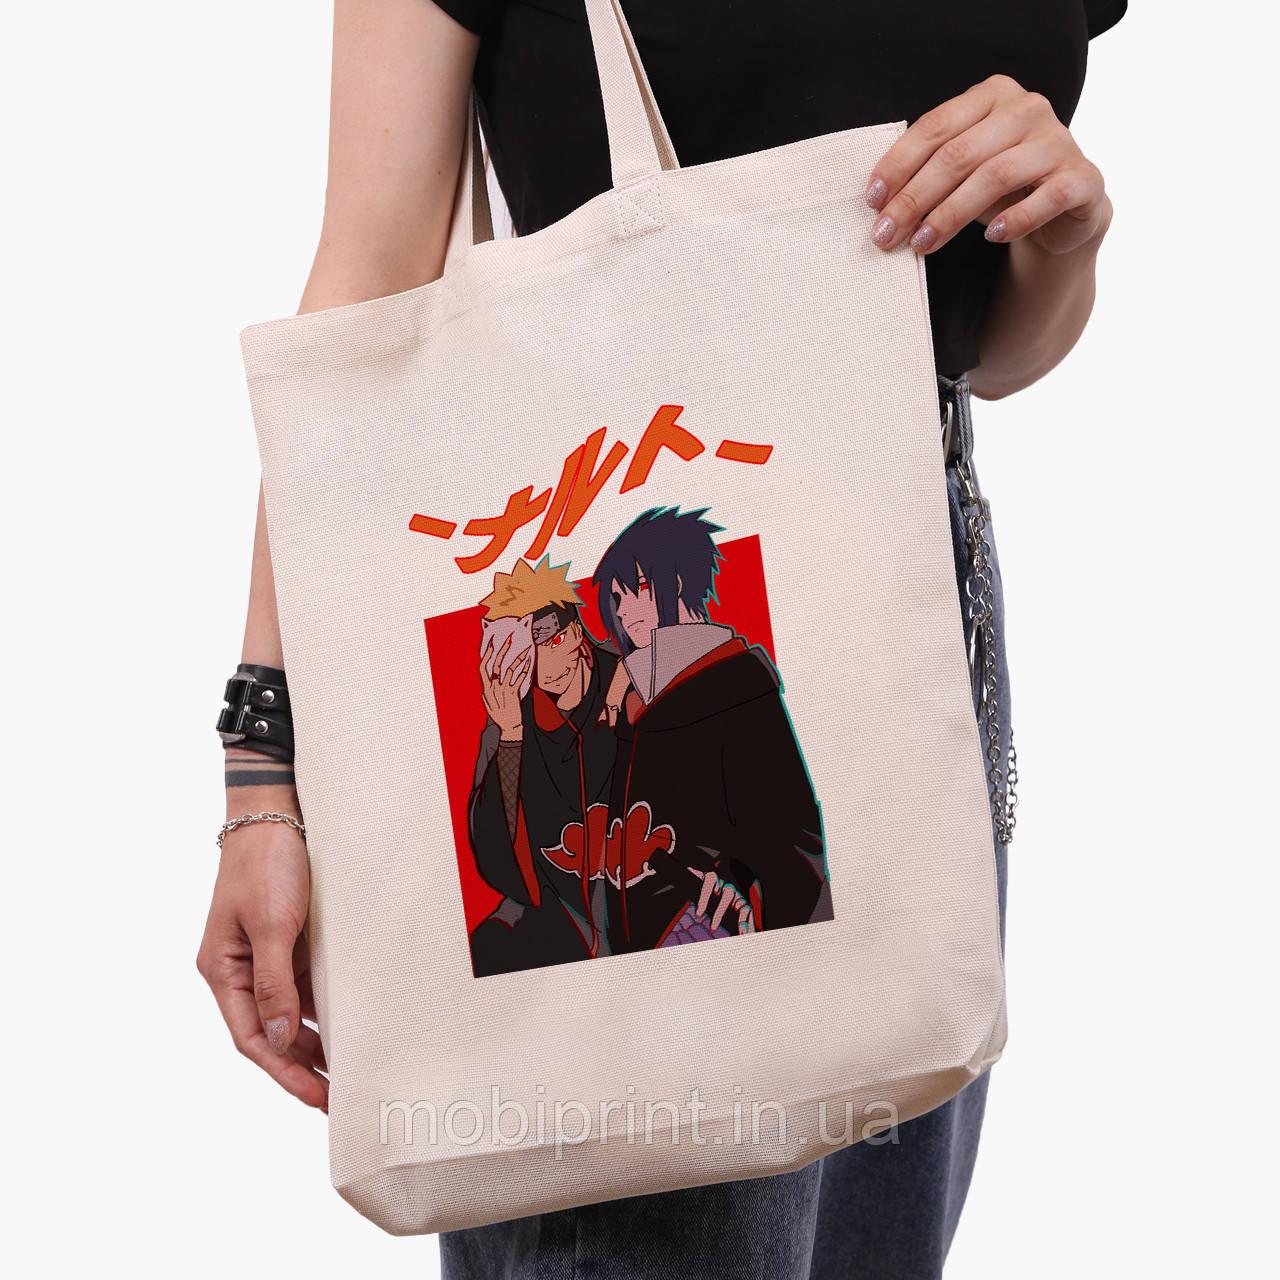 Еко сумка шоппер біла Узумакі Наруто і Саске Учіха (Naruto Uzumaki and Sasuke Uchiha) (9227-2815-1) 41*39*8